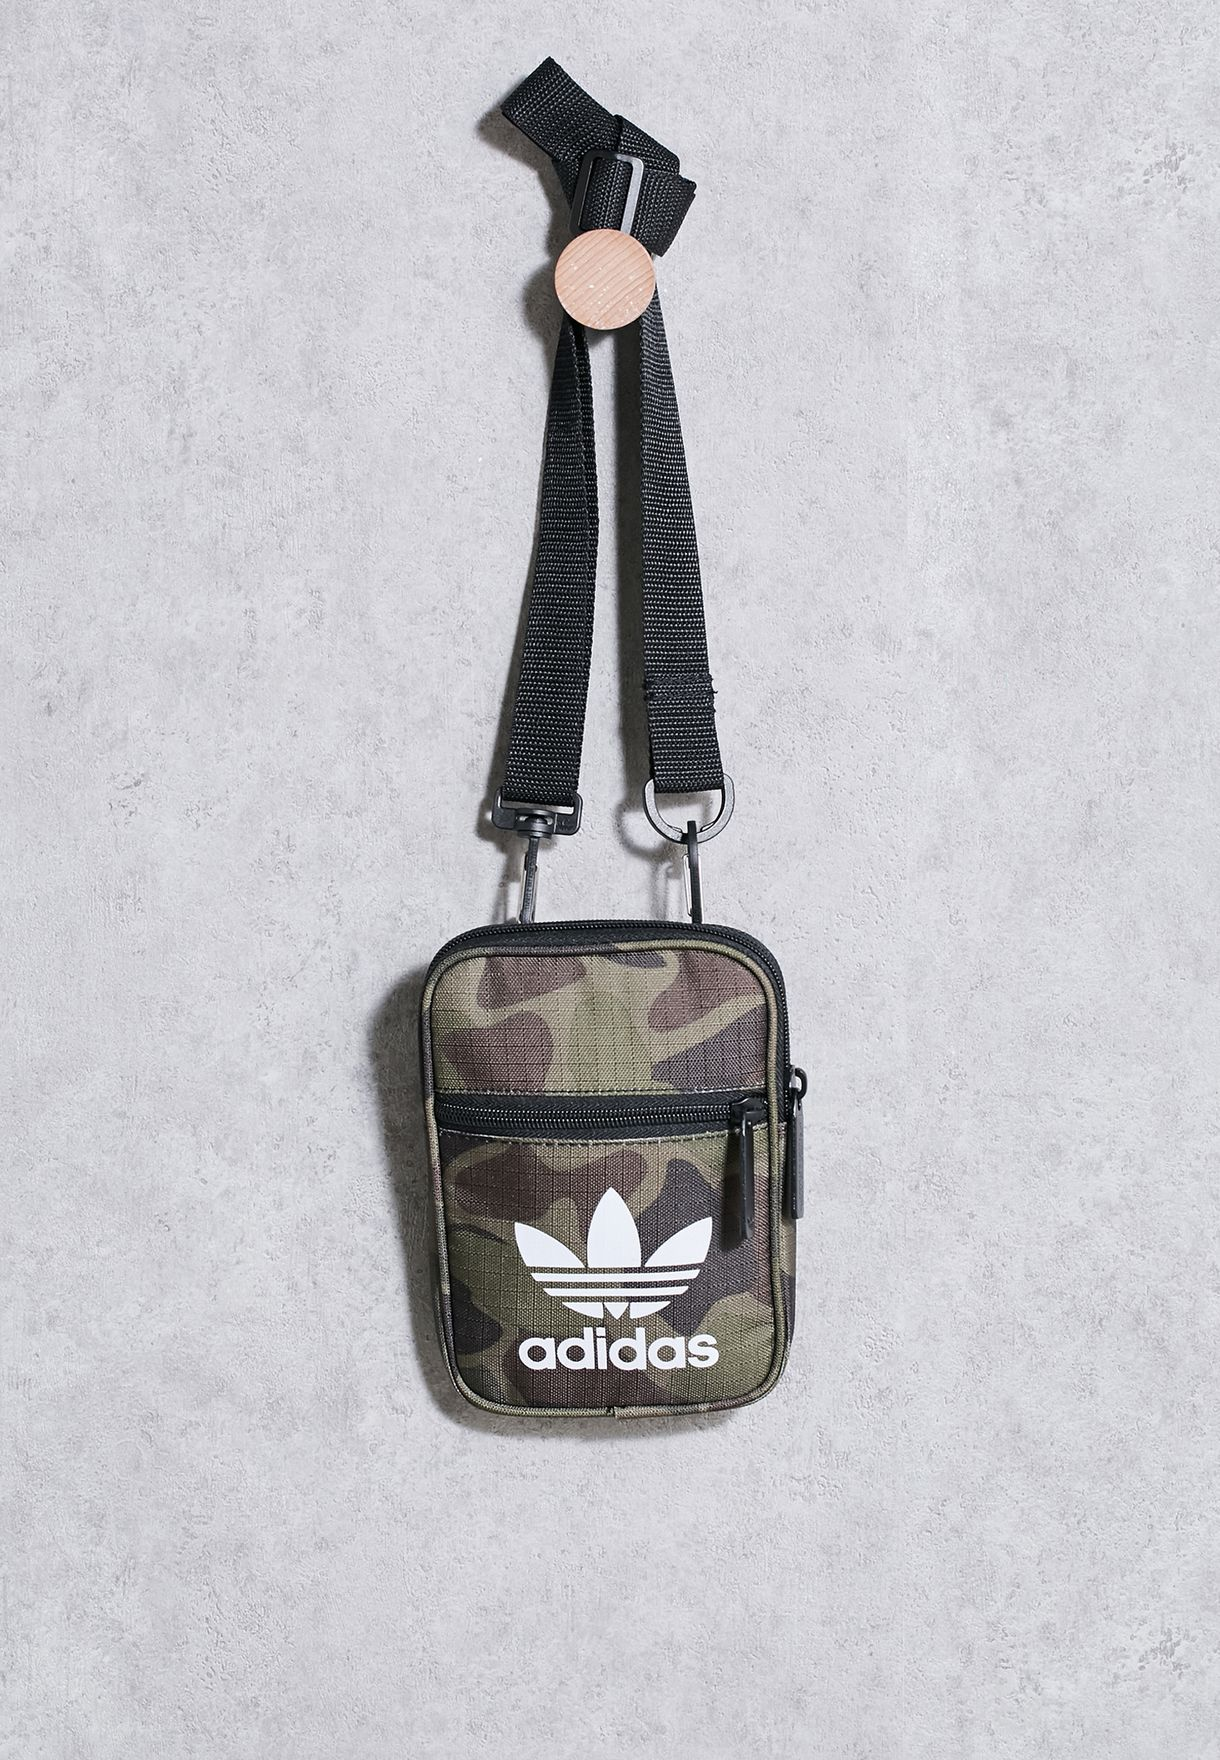 078df4e600 Shop adidas Originals prints Festival Bag BK7212 for Men in Kuwait -  AD478AC46JKV